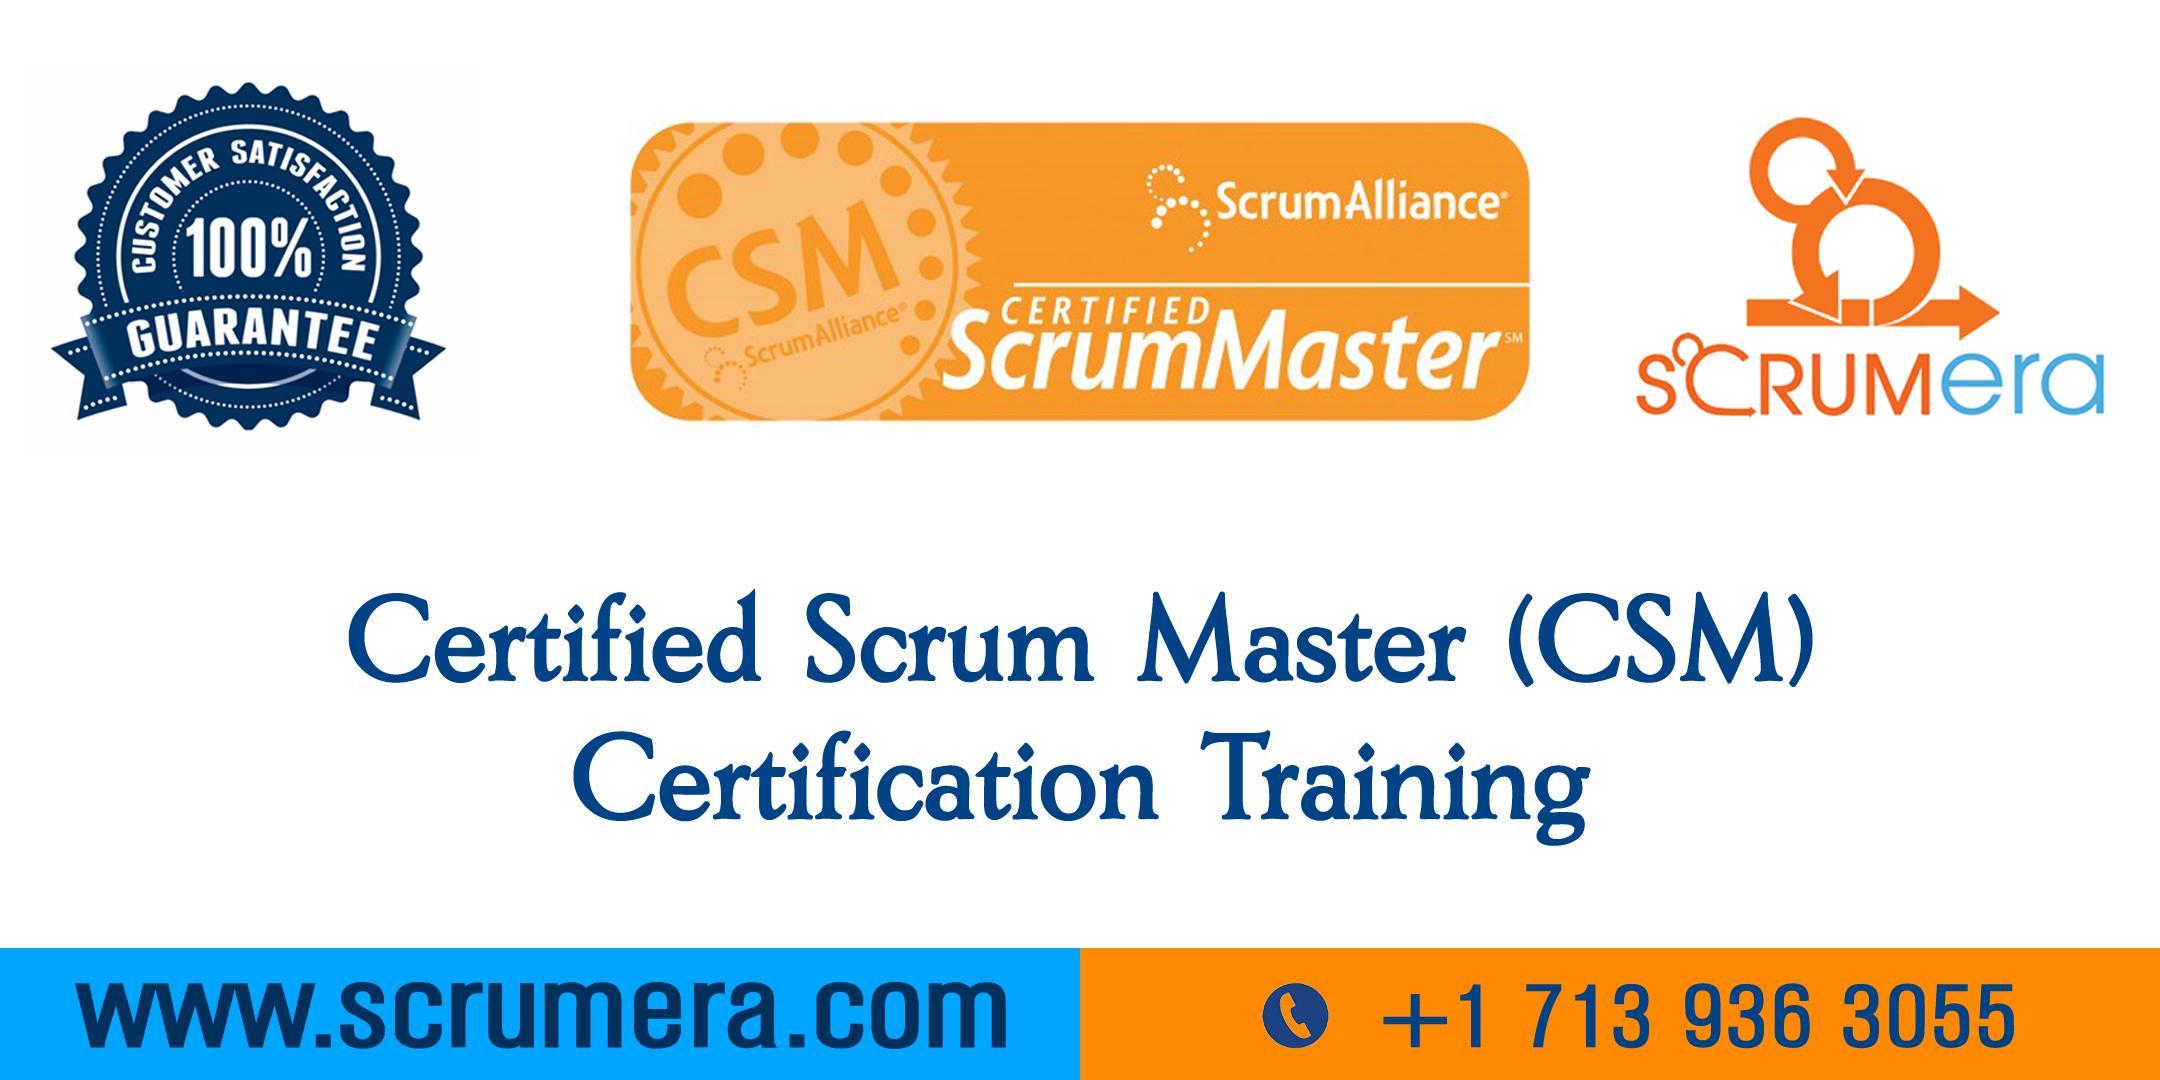 Scrum Master Certification | CSM Training | CSM Certification Workshop | Certified Scrum Master (CSM) Training in Pearland, TX | ScrumERA